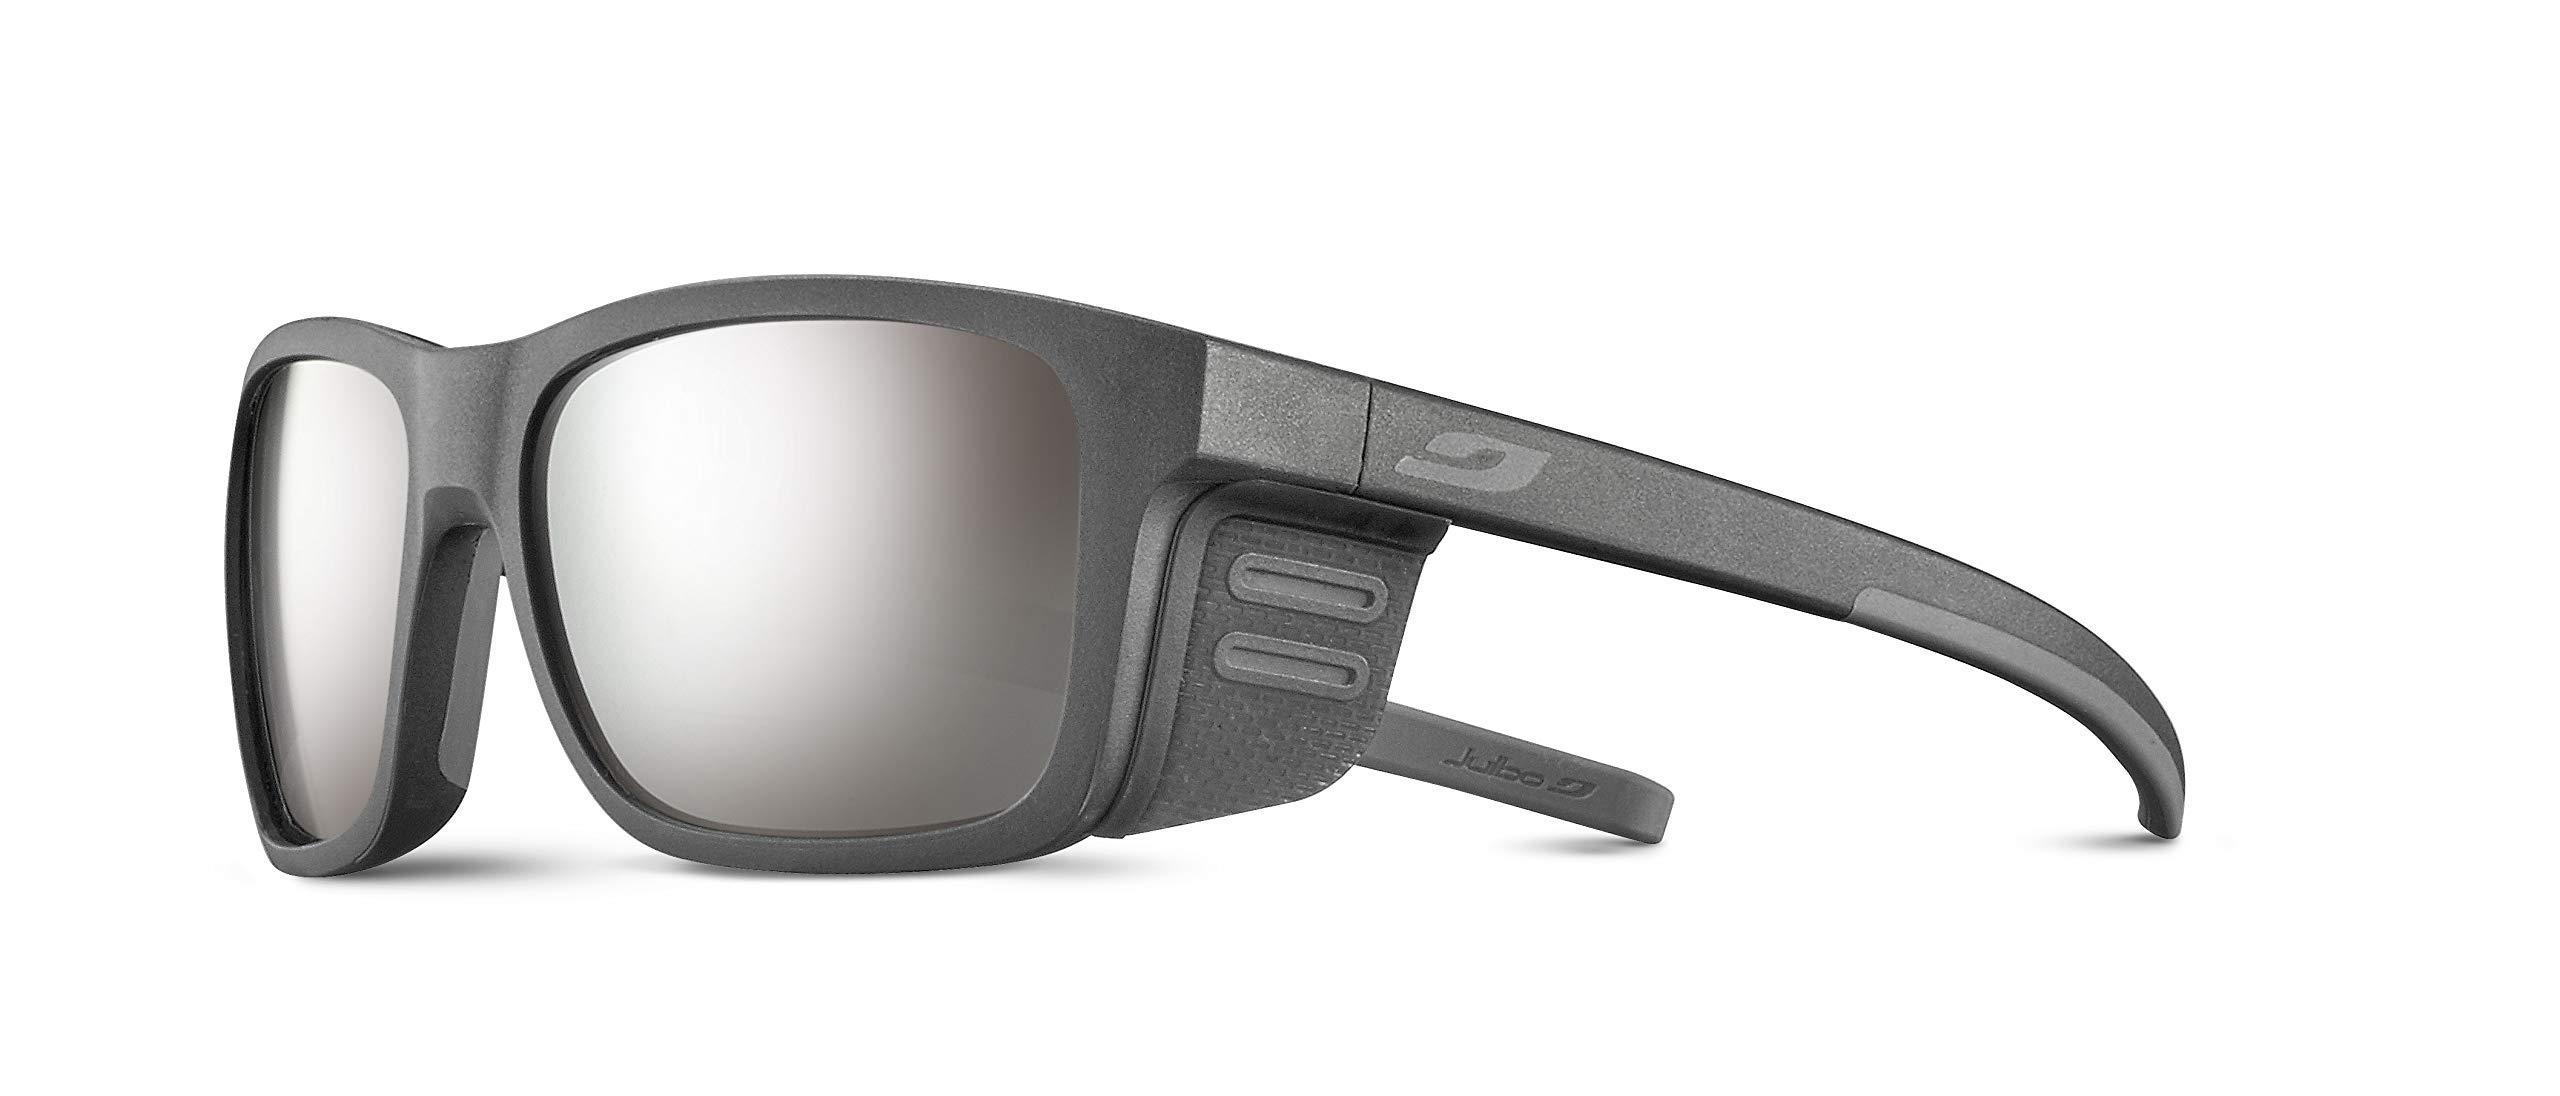 Julbo Cover Junior Sunglasses - Spectron 4 Baby - Gray/Gray